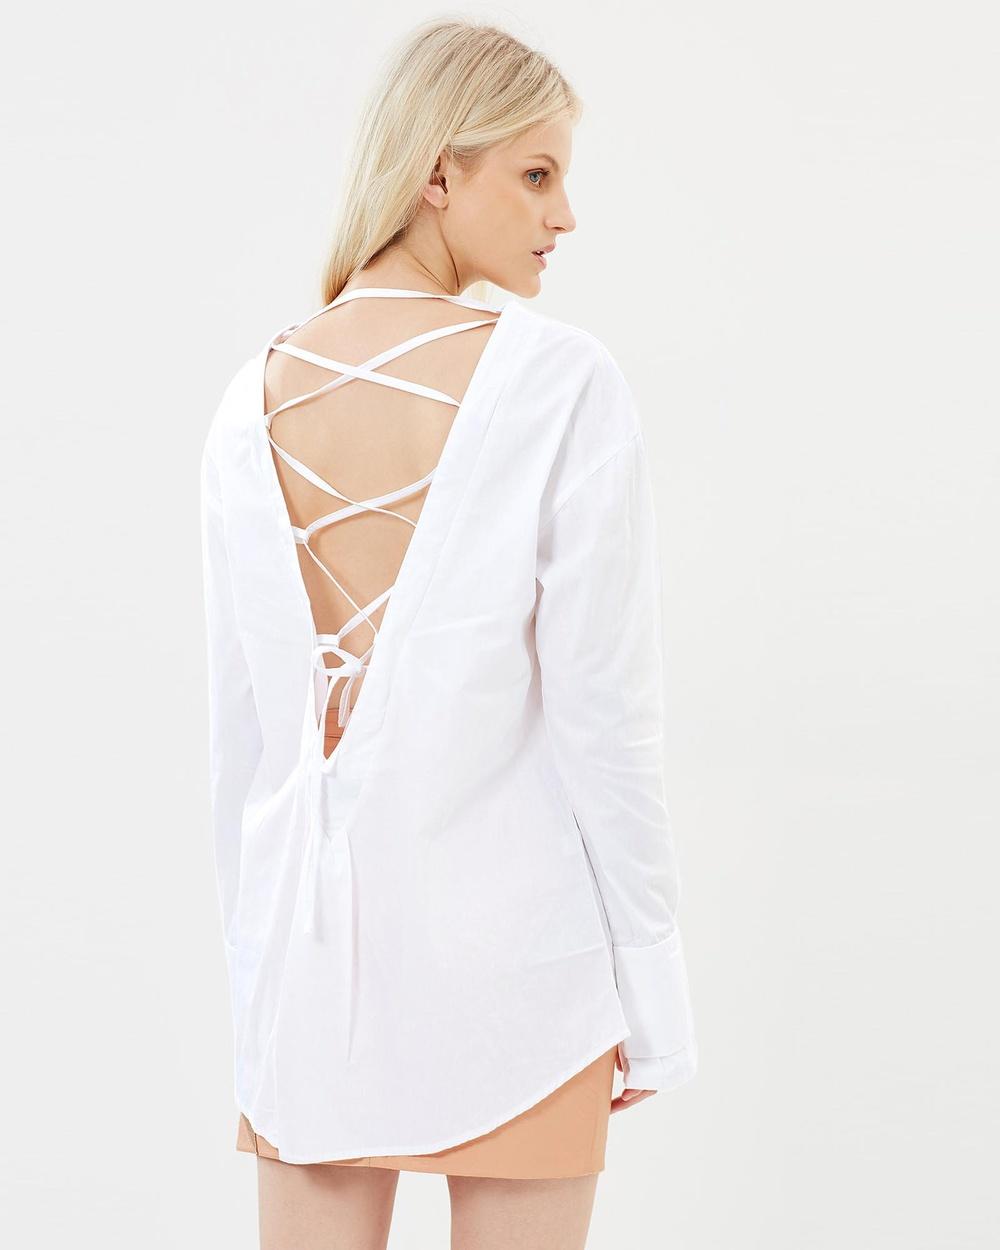 Isabelle Quinn Helena Shirt Tops White Helena Shirt